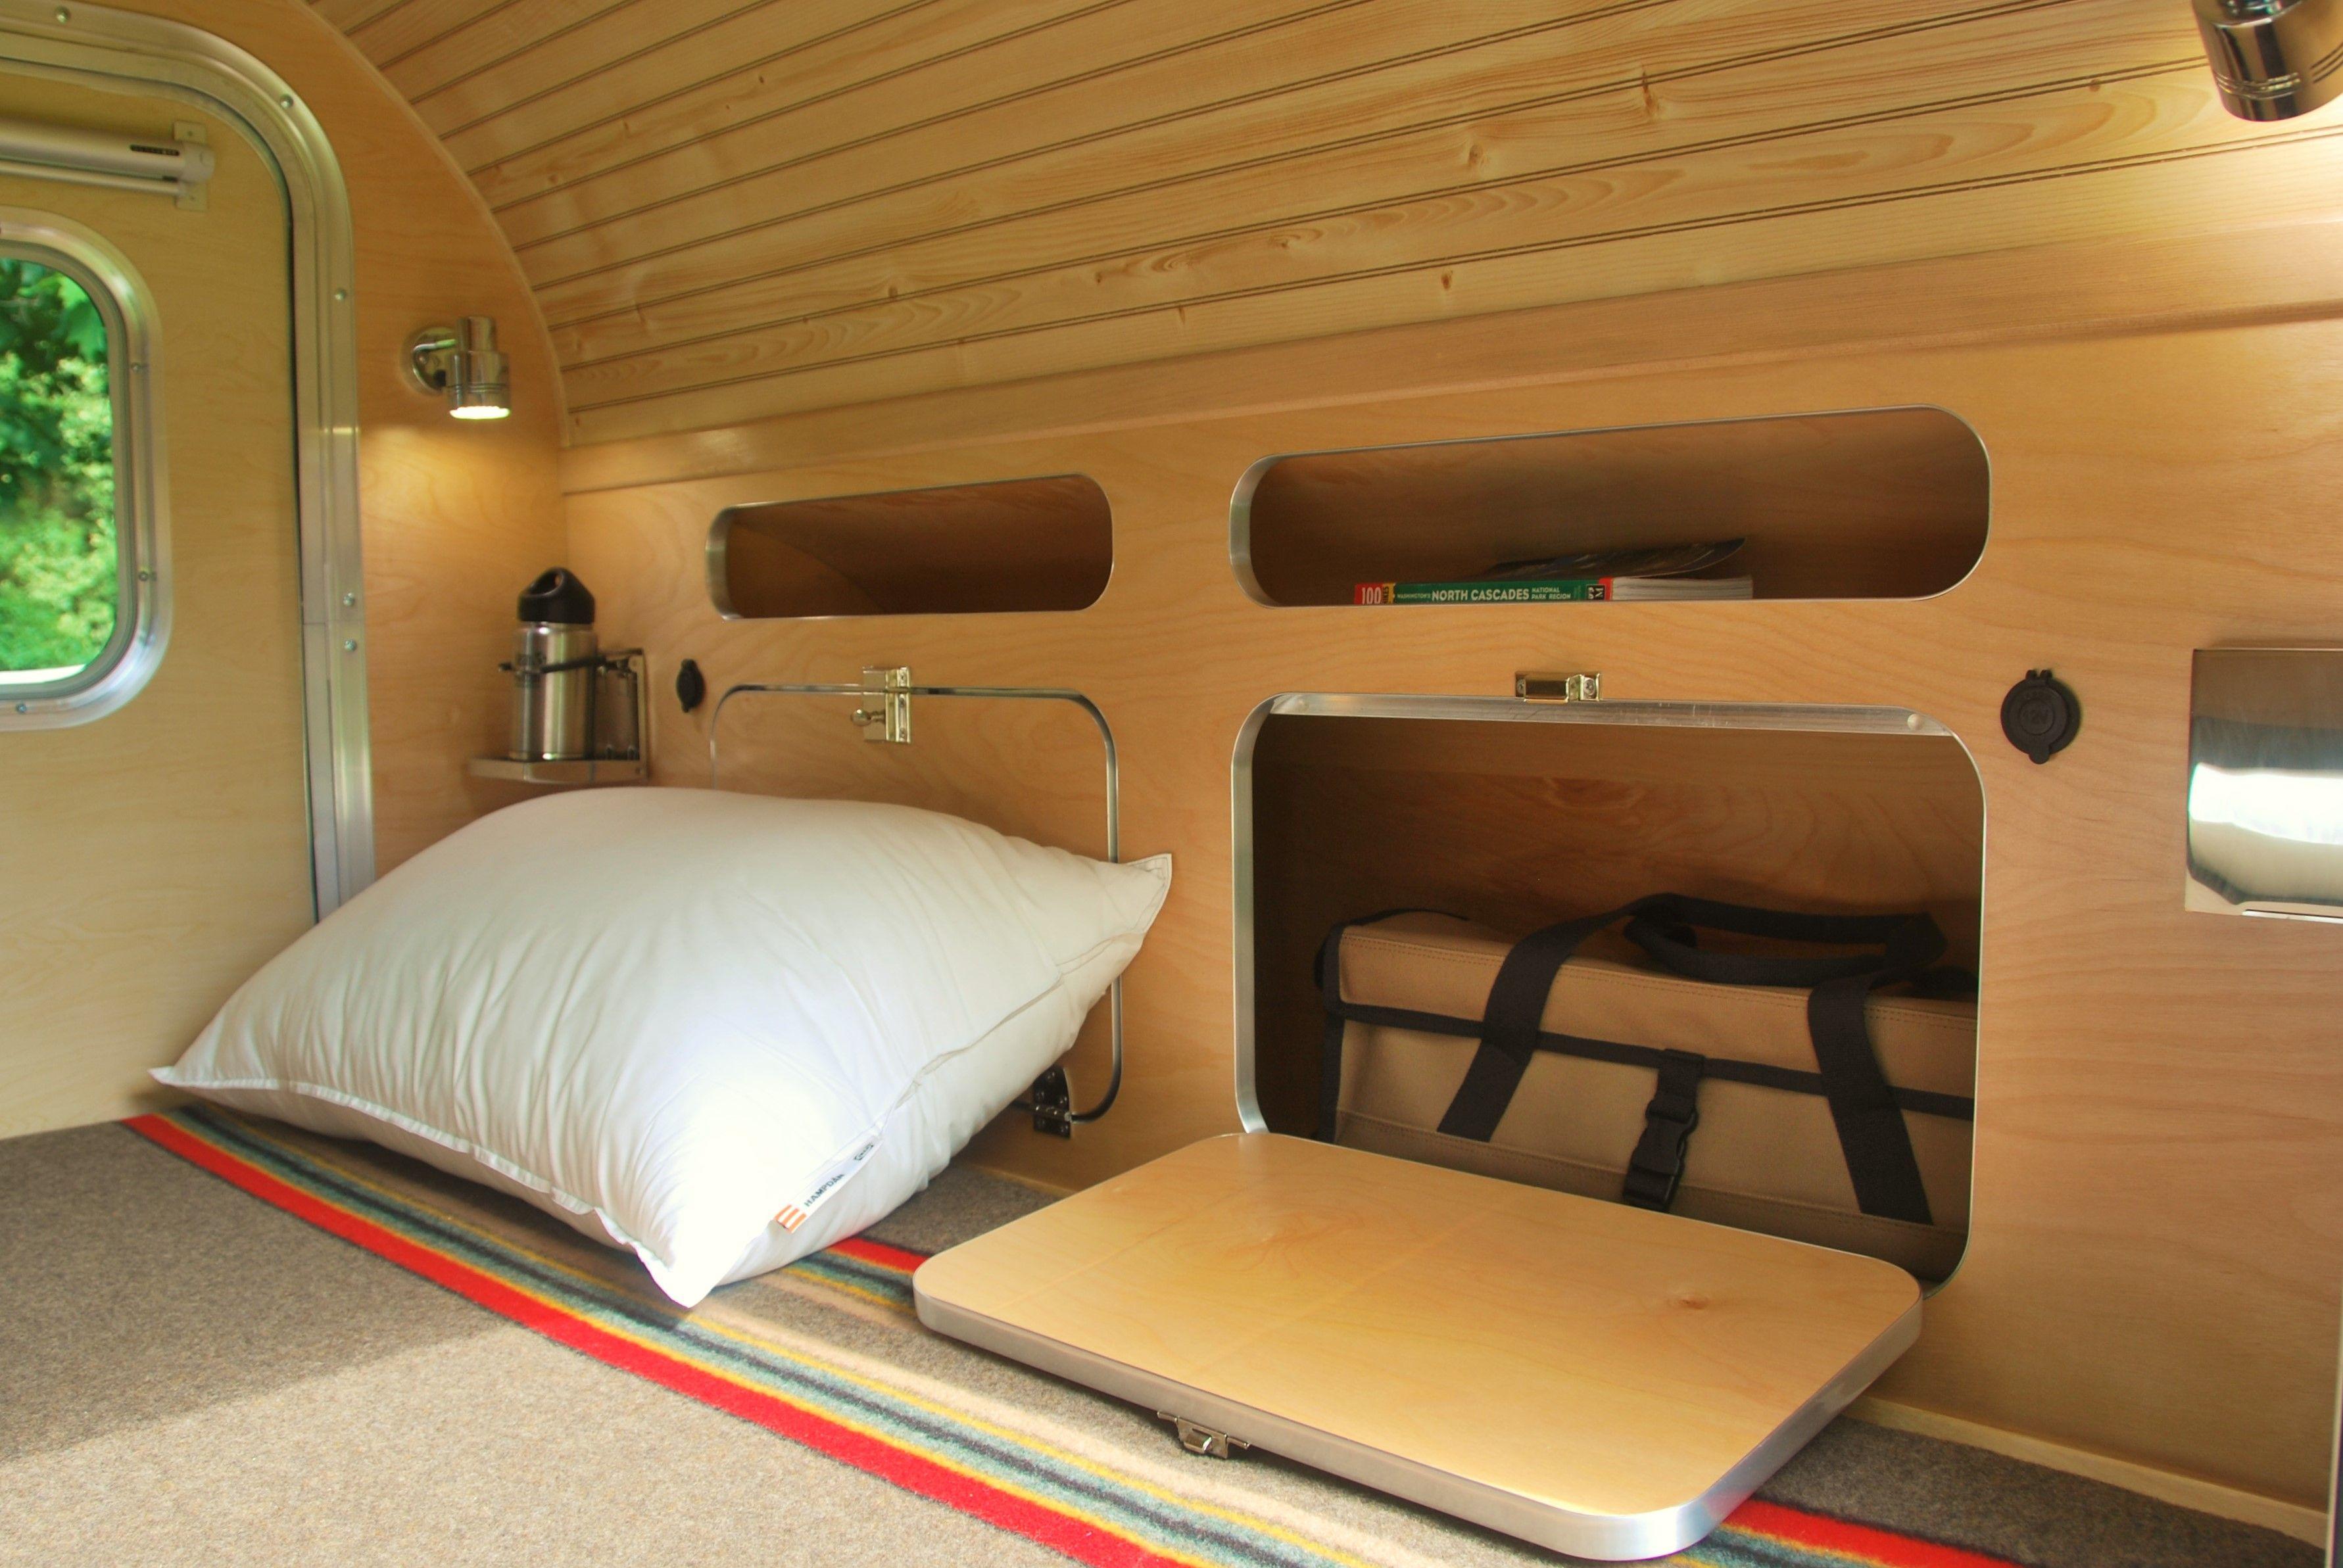 High Camp Trailers classic teardrop trailer built in Portland